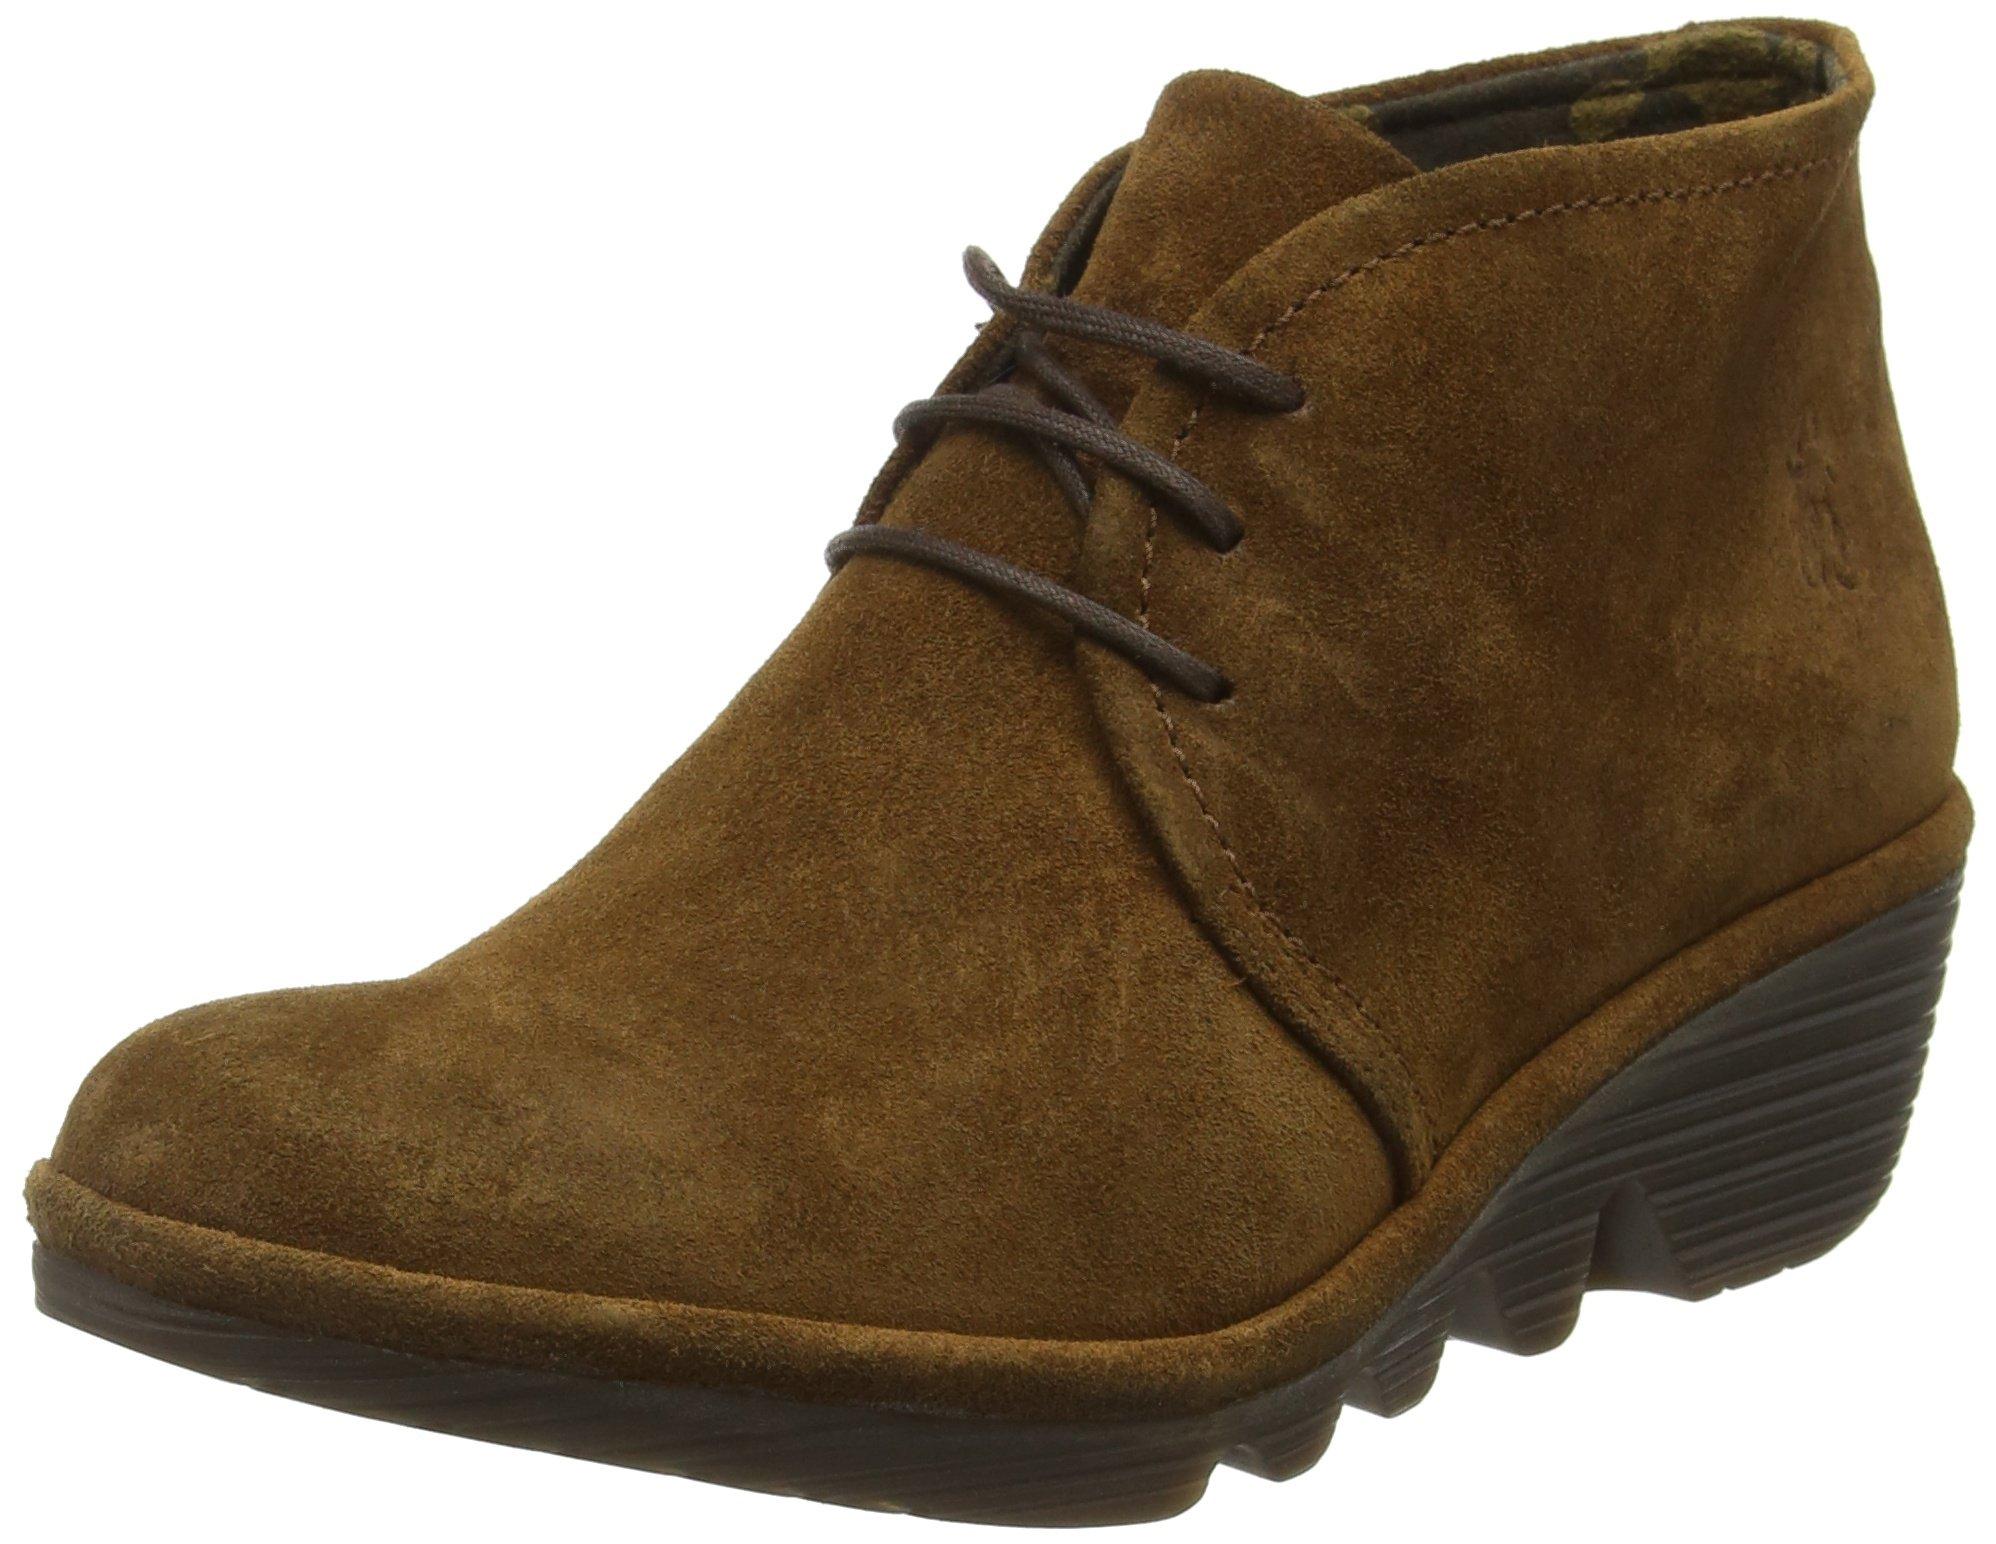 fly london women 39 s pert desert boots brown camel 049 2 5. Black Bedroom Furniture Sets. Home Design Ideas